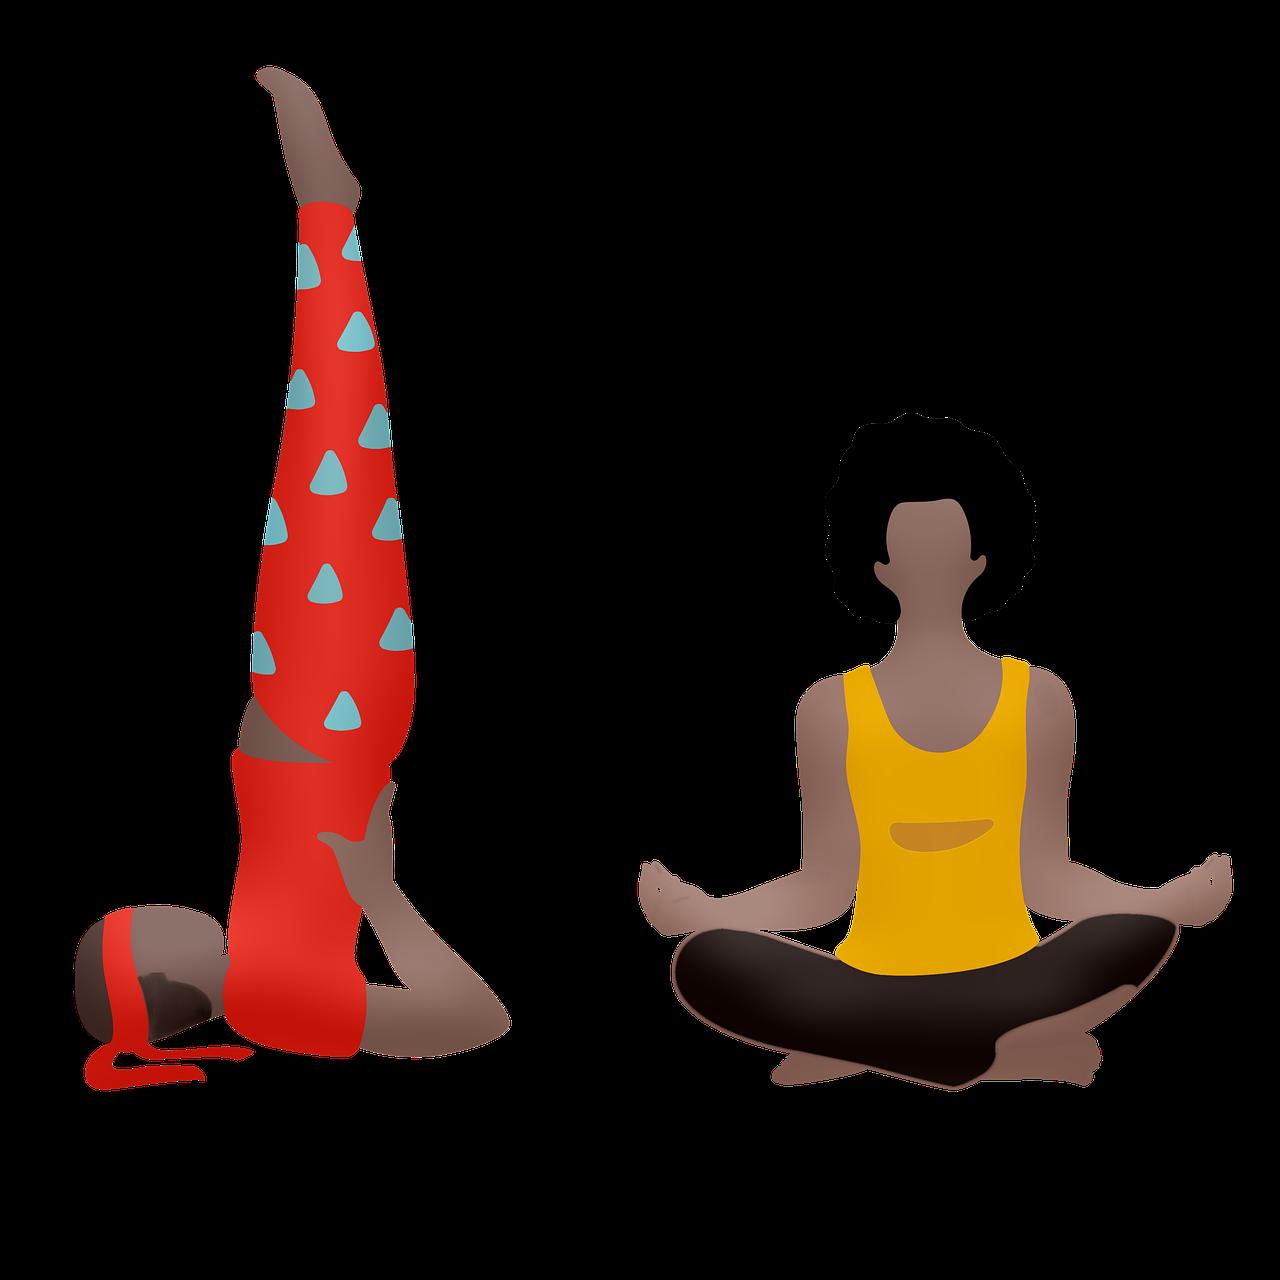 People Characters Sports Yoga Free Image On Pixabay